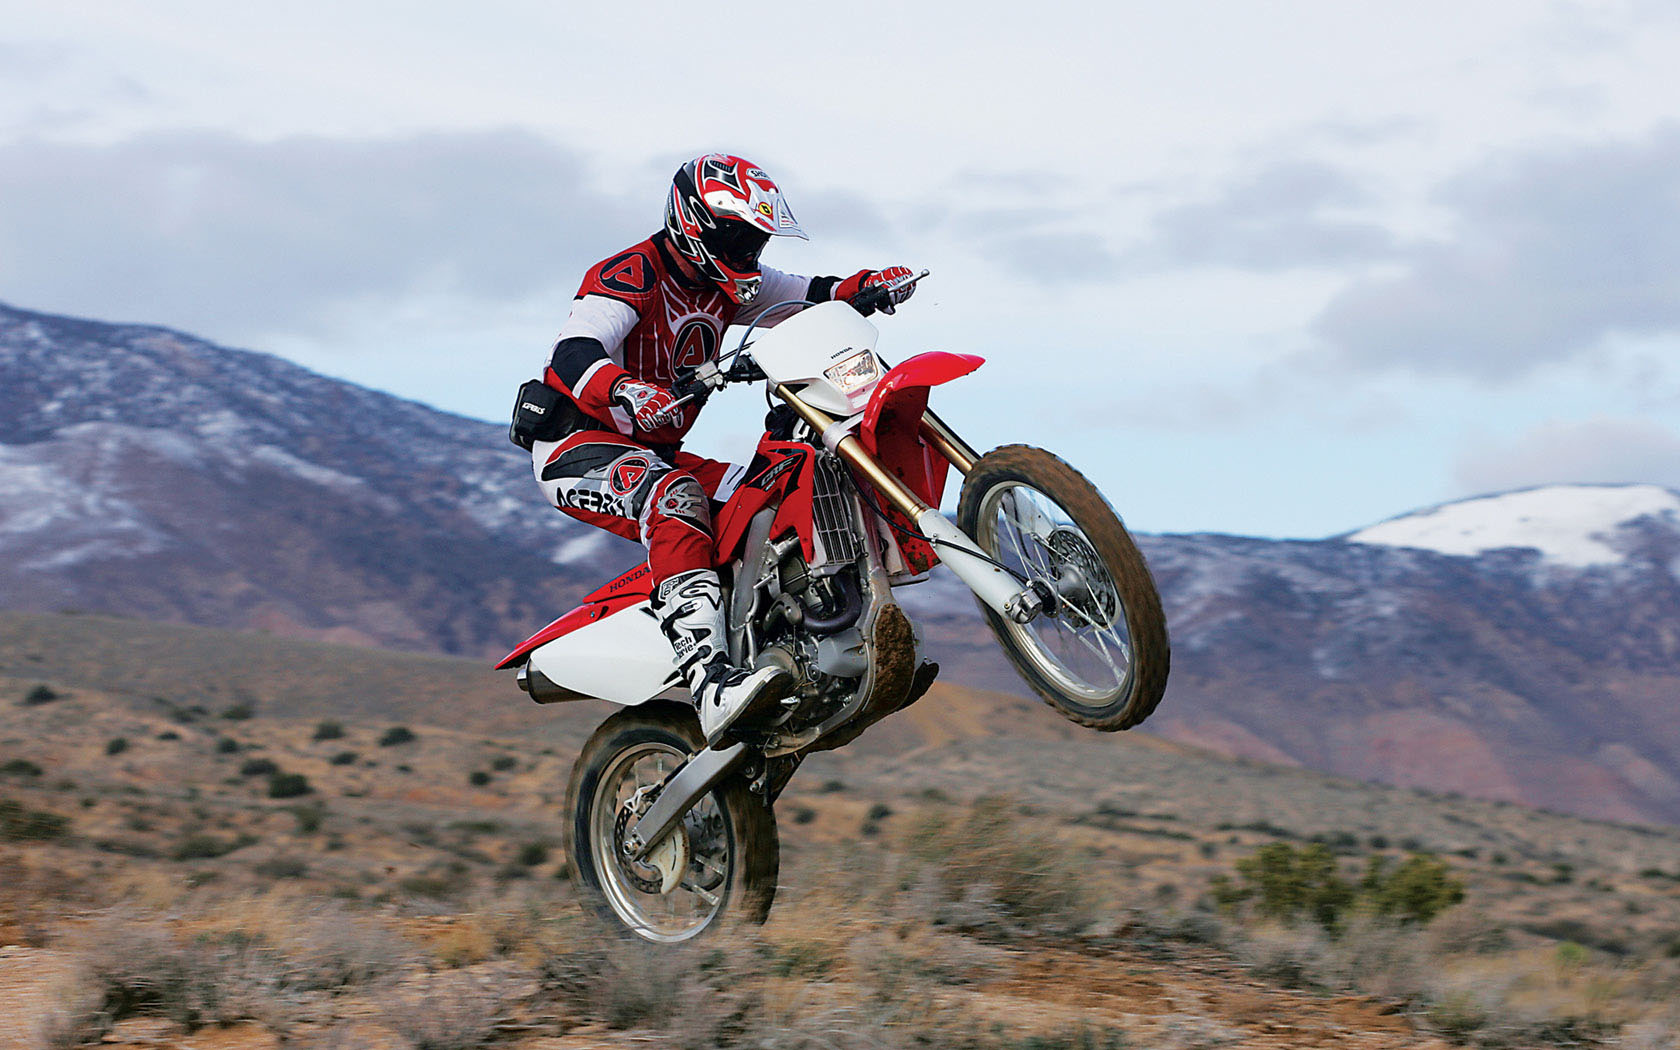 Motocross Wallpaper 41688 1680x1050px